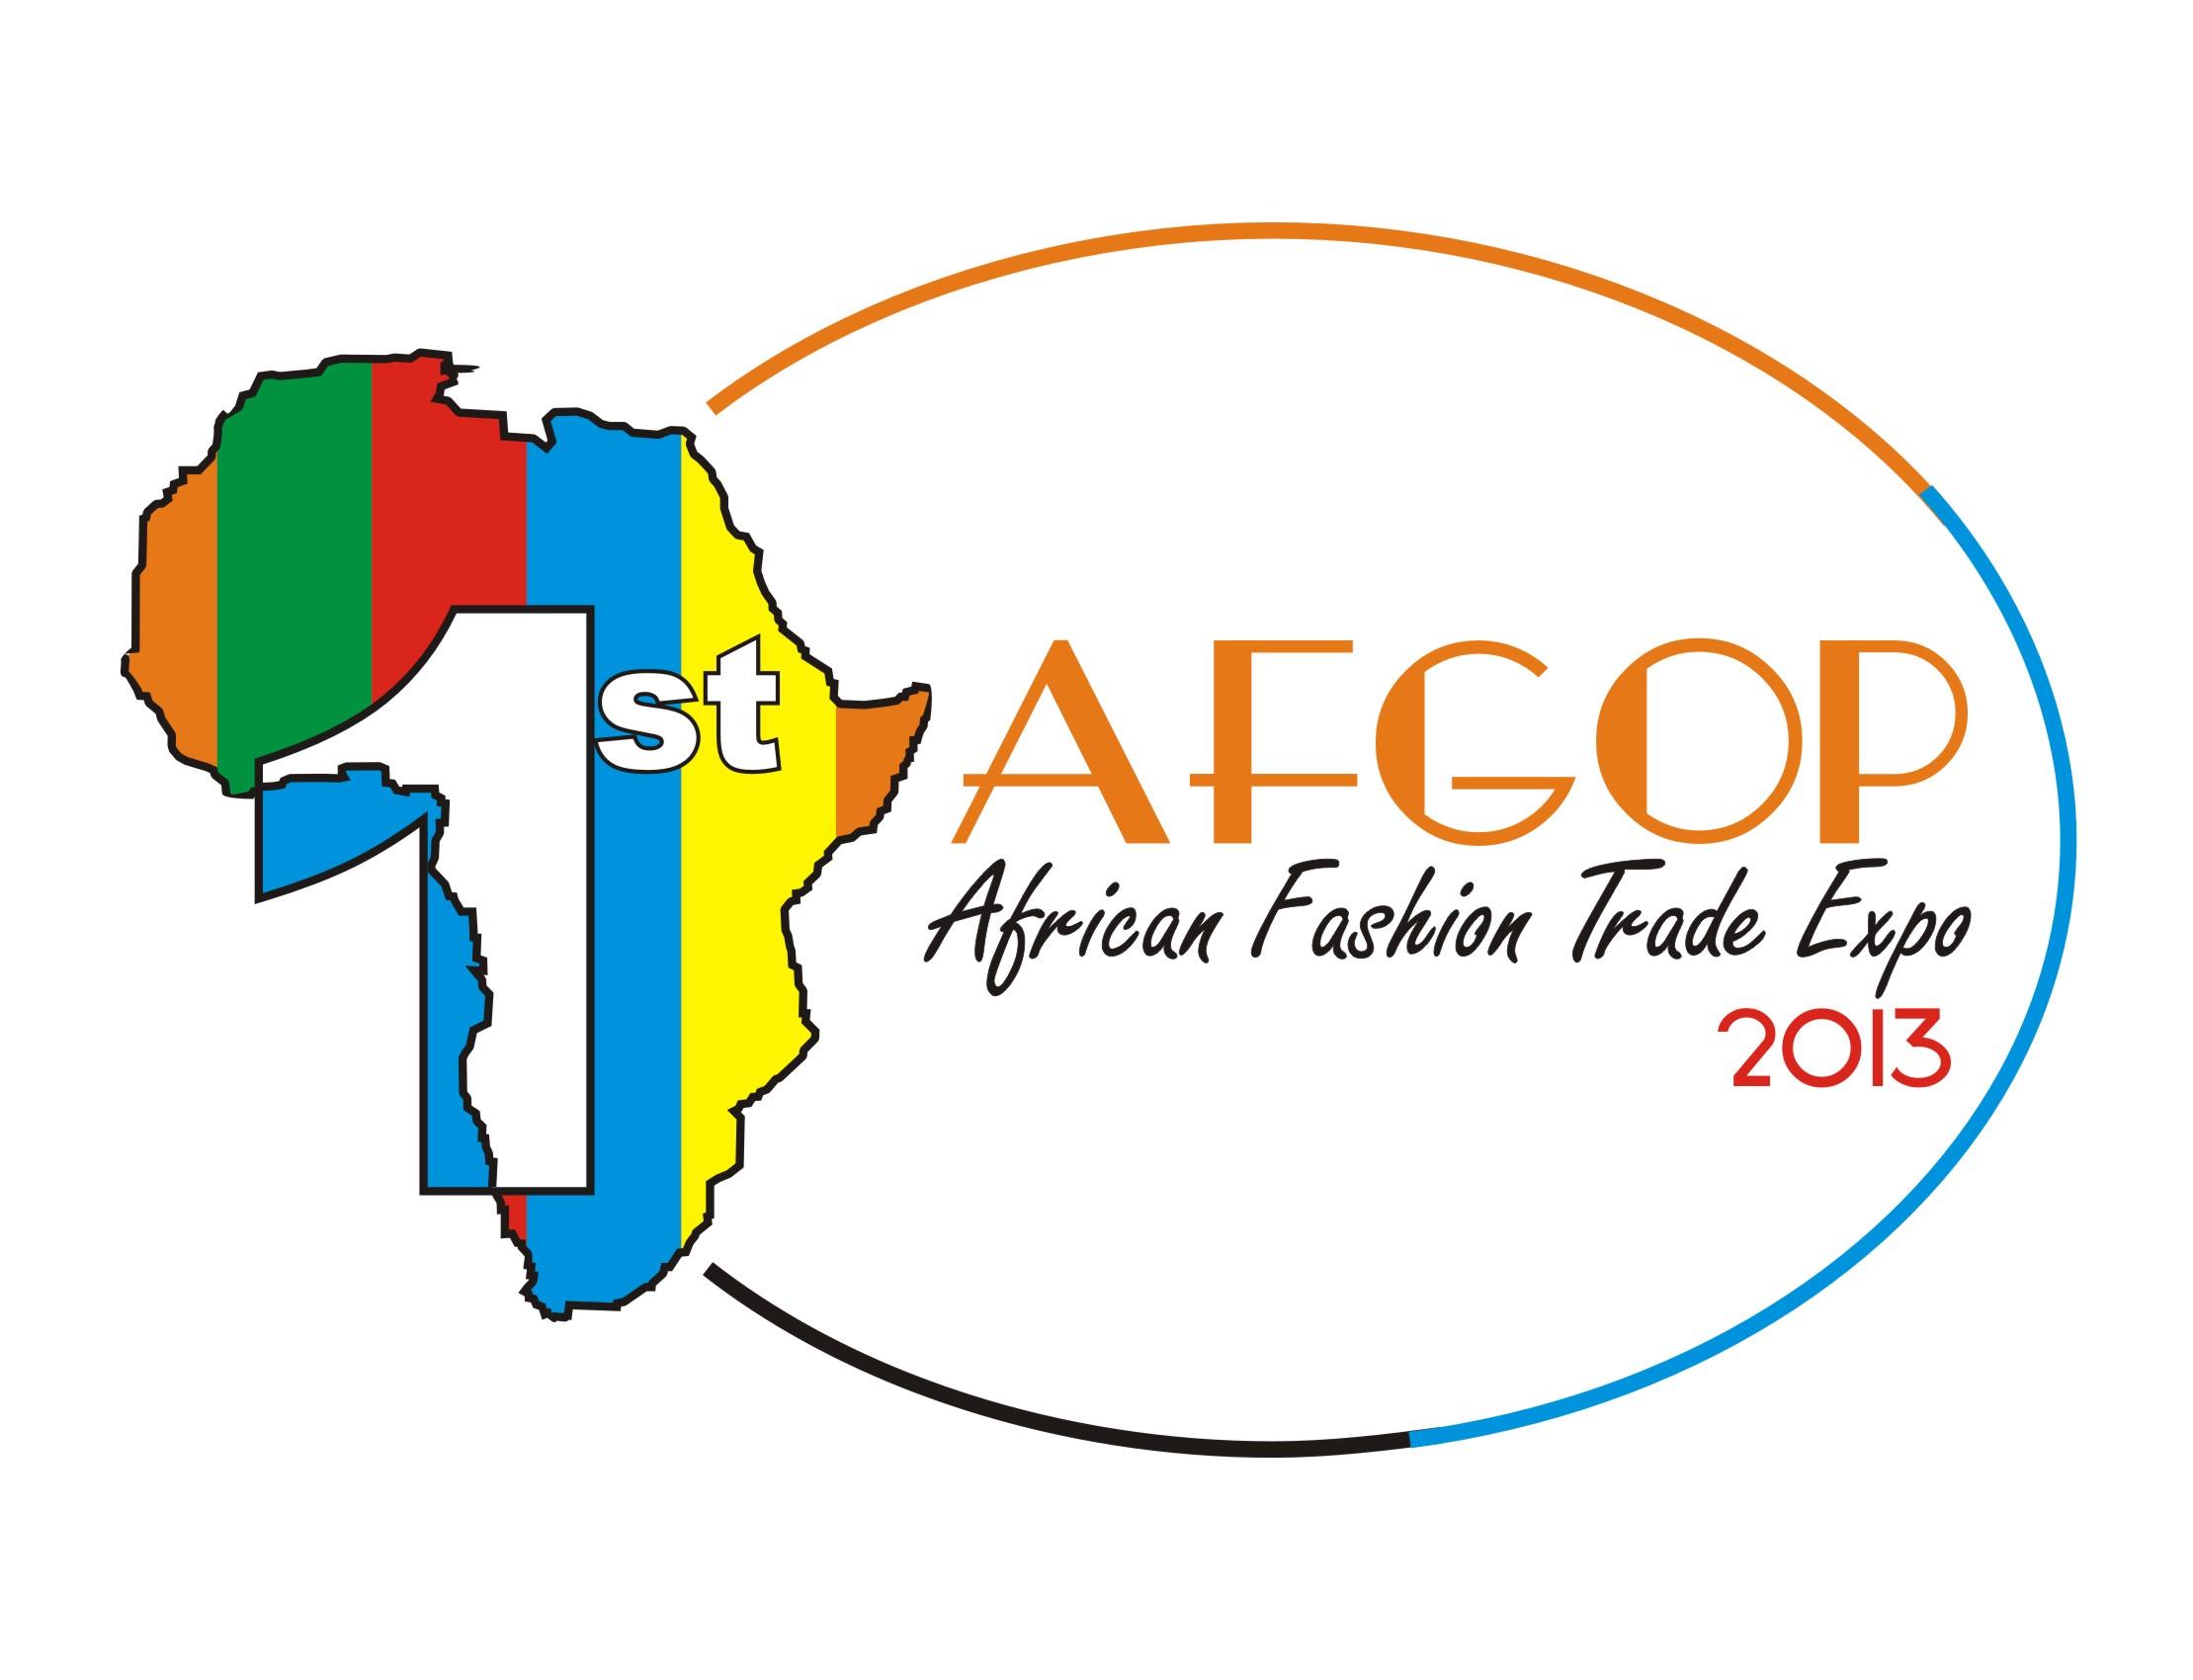 afgop-expo